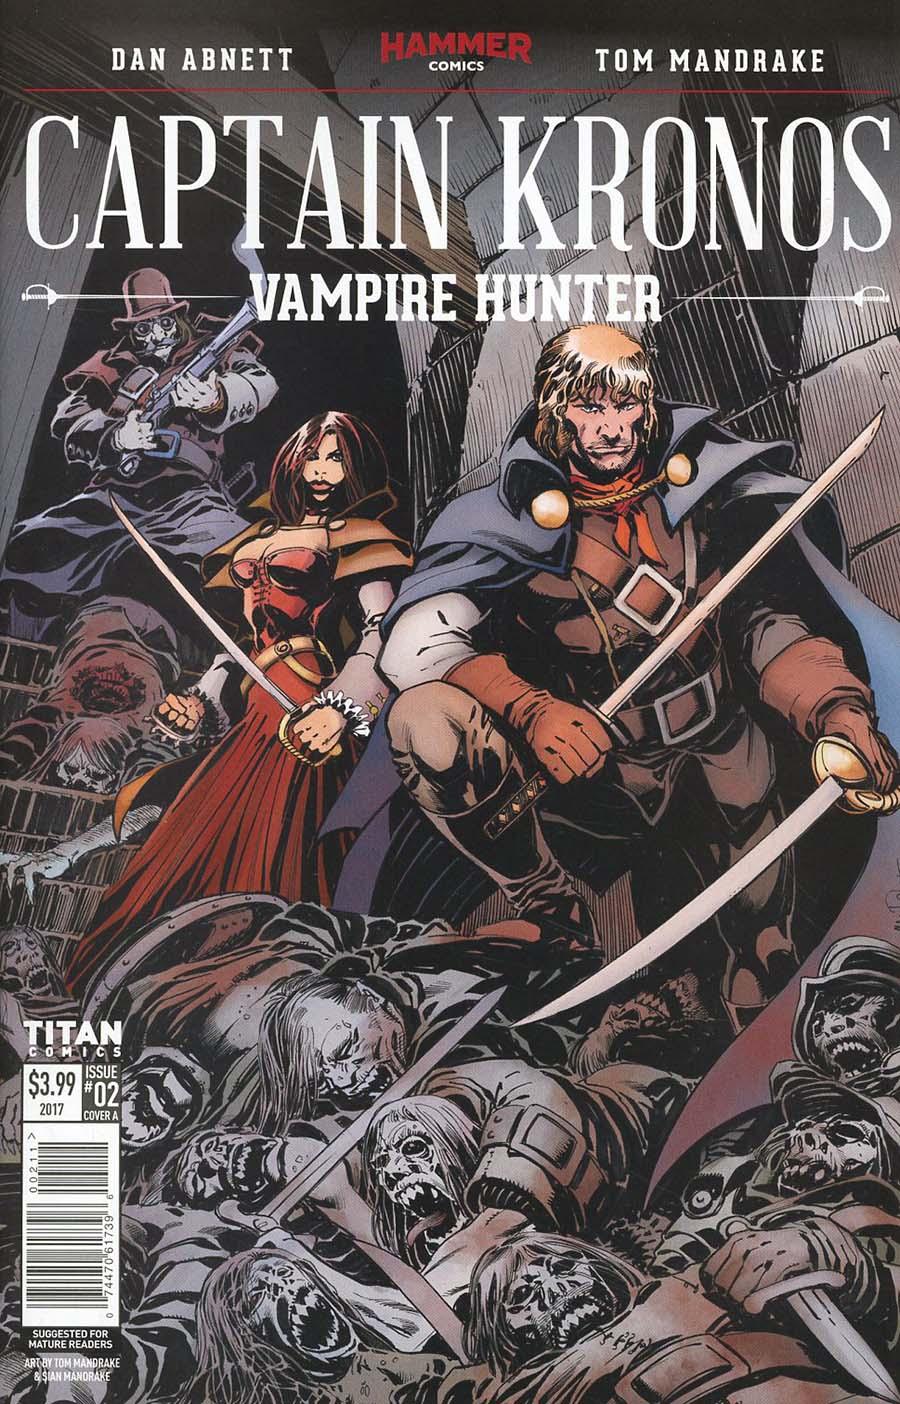 Hammer Comics Captain Kronos Vampire Hunter #2 Cover A Regular Tom Mandrake Cover